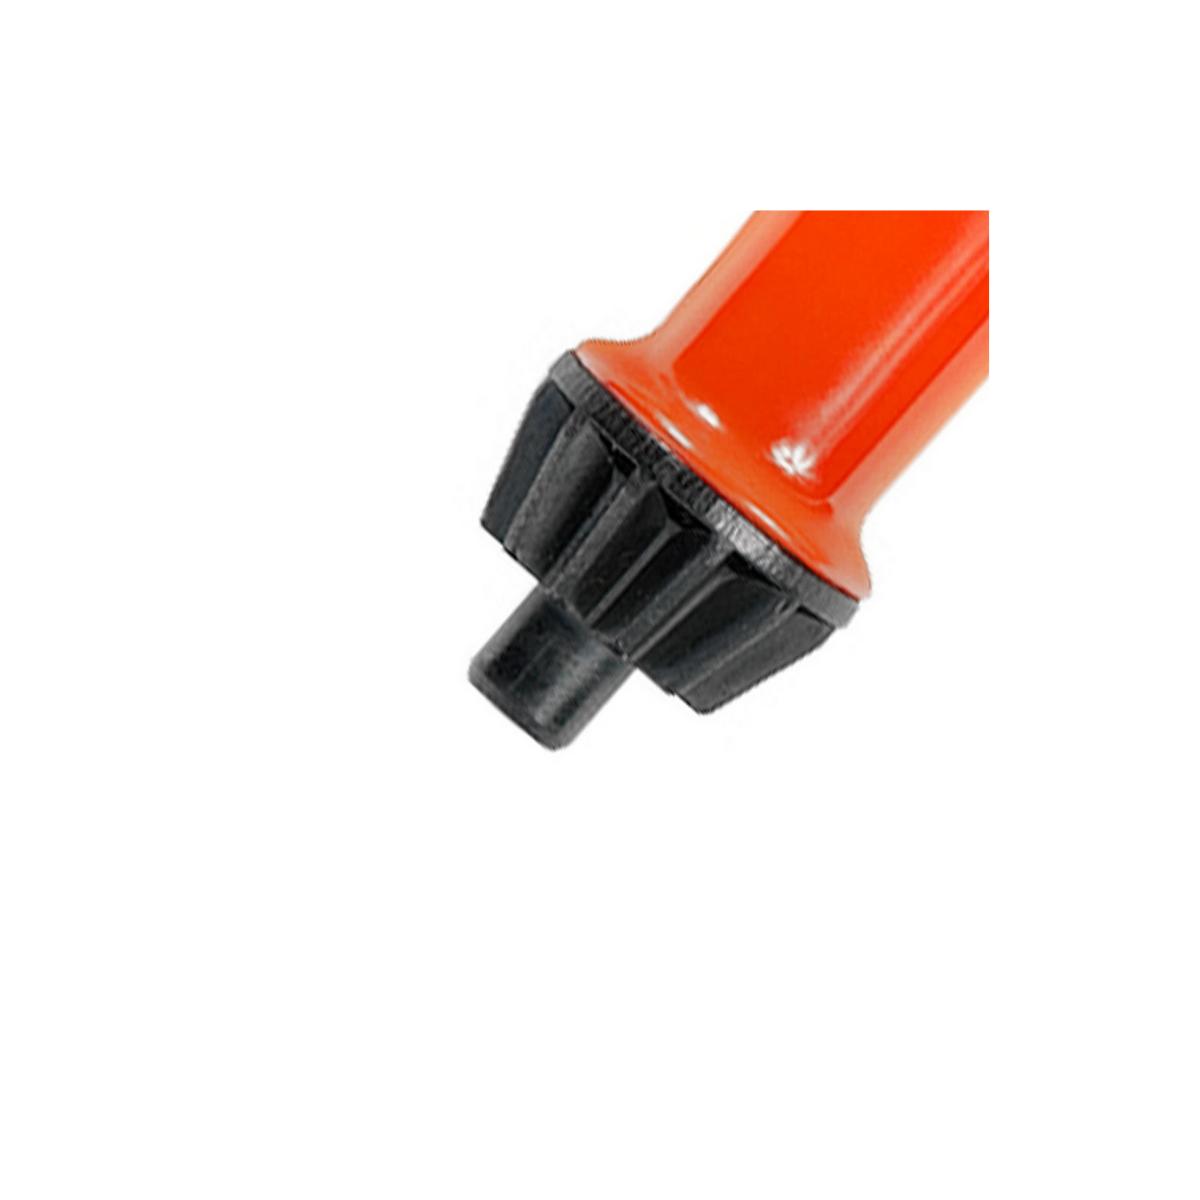 Chave para Mandril Emborrachado 16mm Mtx 168899